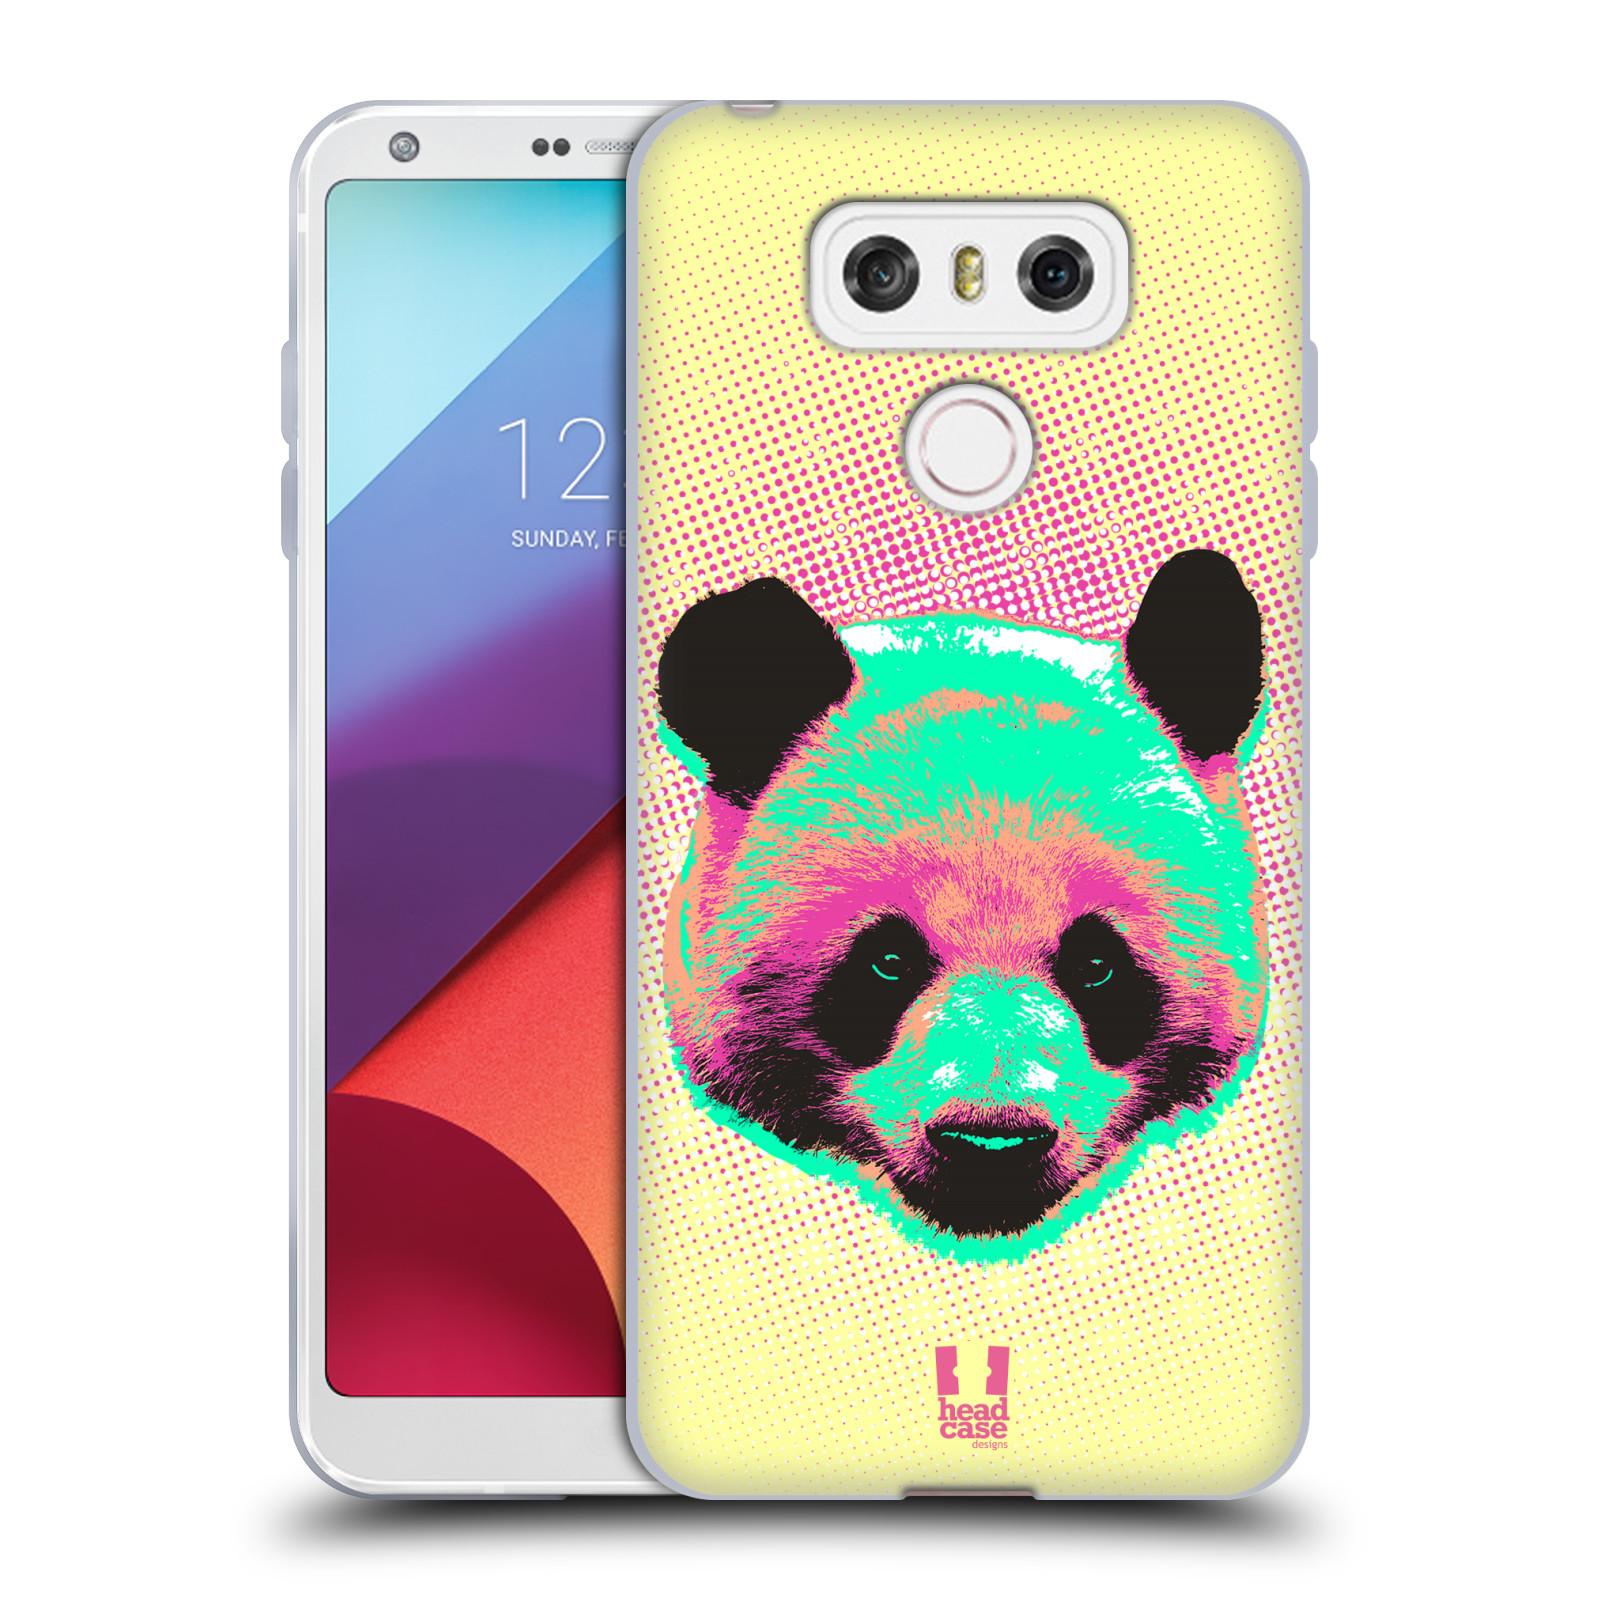 Silikonové pouzdro na mobil LG G6 - Head Case POP PRINT PANDA (Silikonový kryt či obal na mobilní telefon LG G6 H870 / LG G6 Dual SIM H870DS)